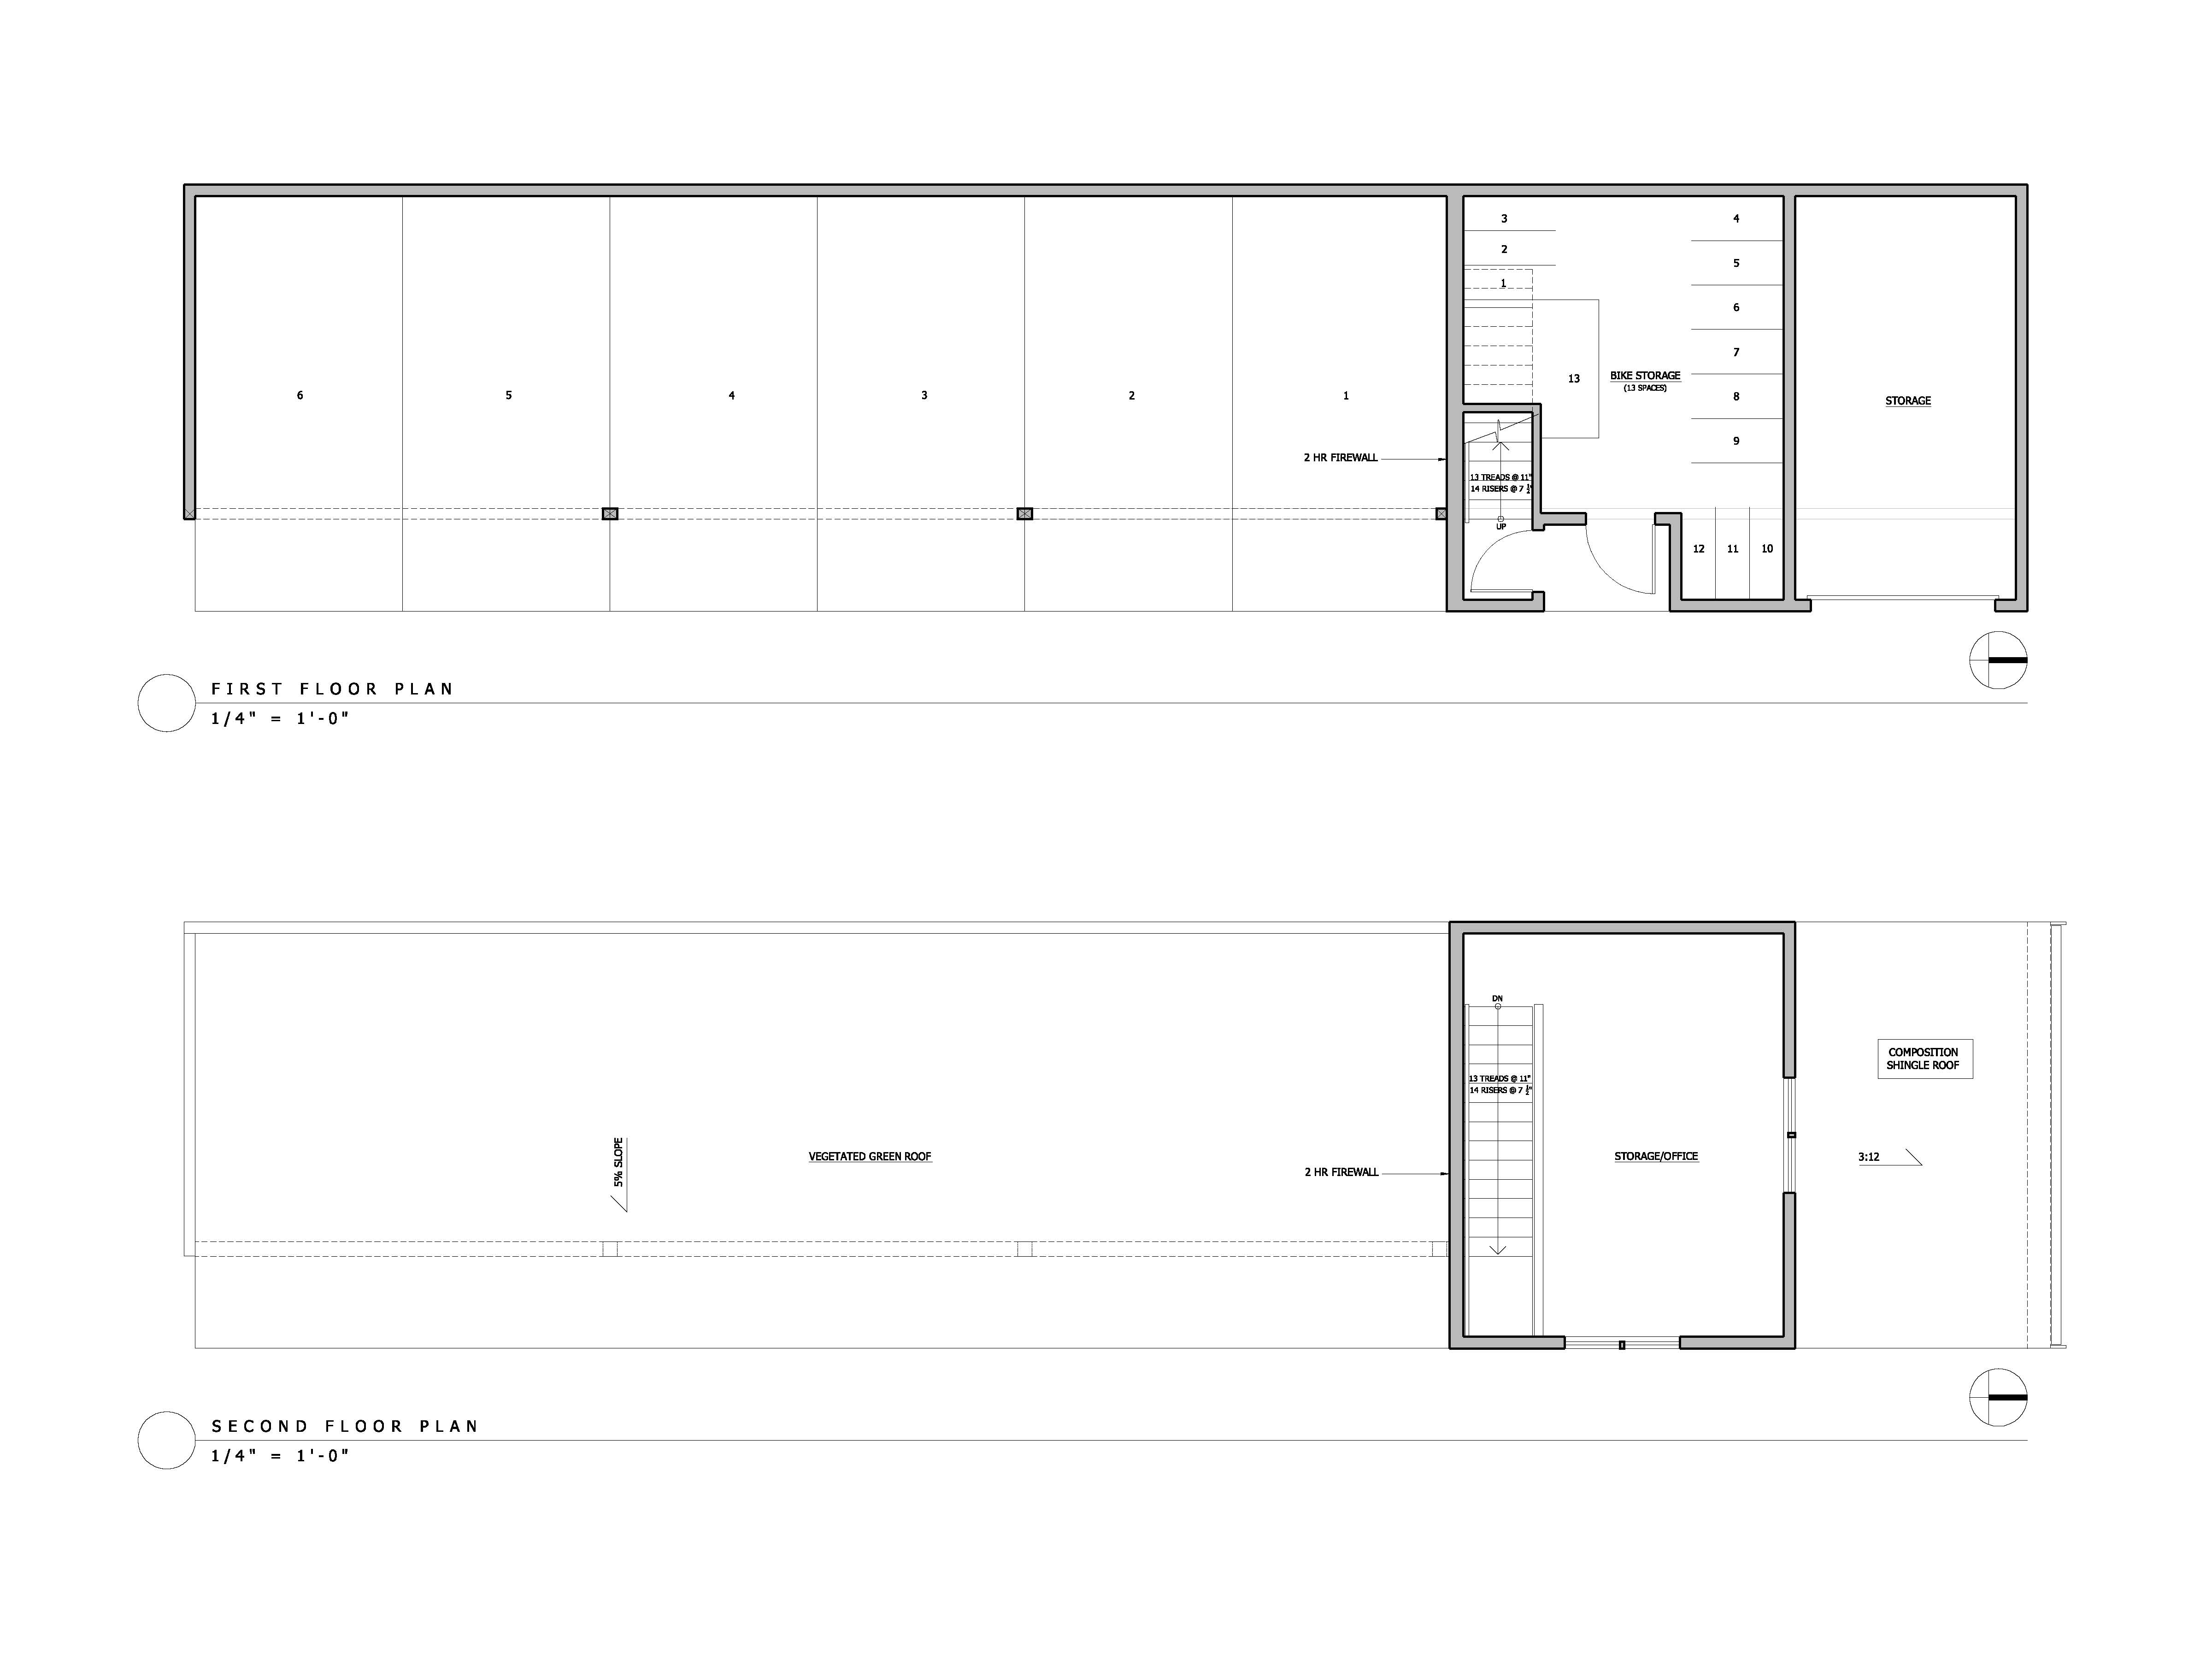 Carport Plans Software PDF Woodworking